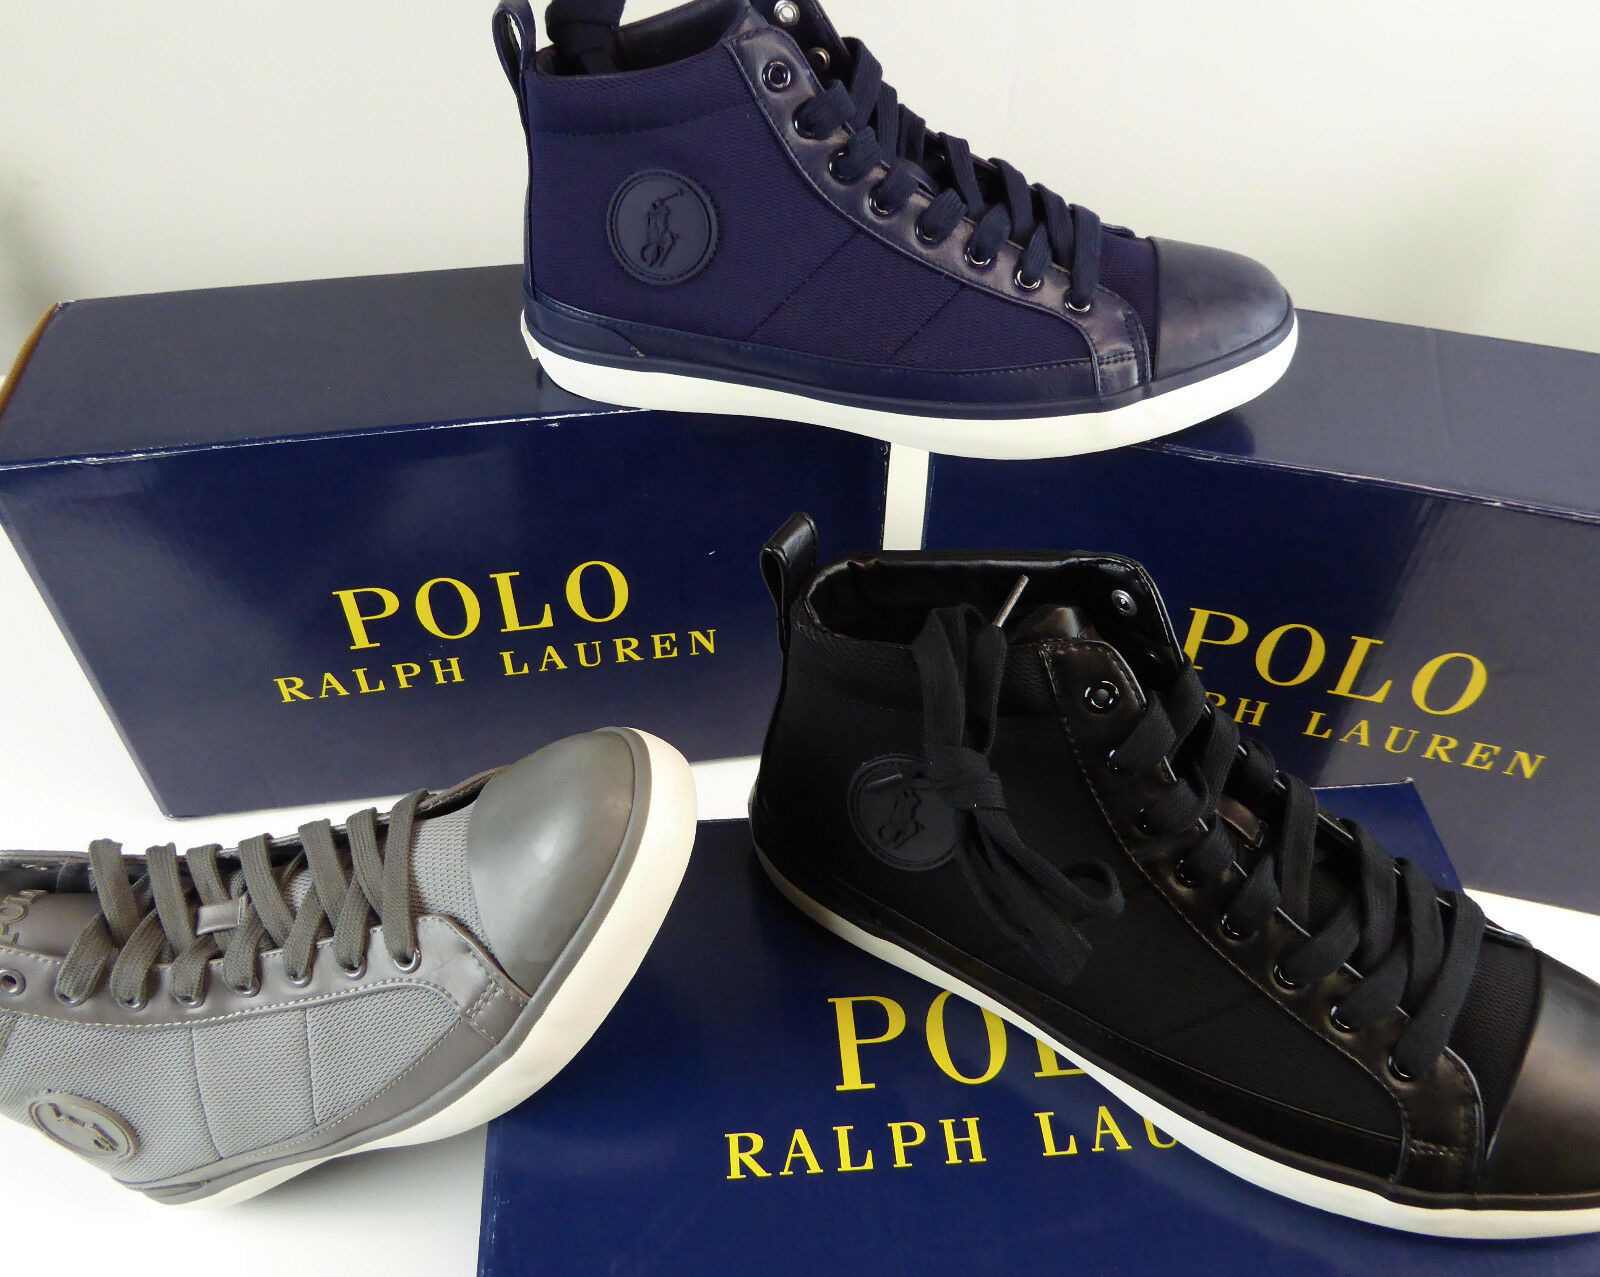 Polo Ralph Lauren Old School Clarke Clarke Clarke High-Top Mesh scarpe da ginnastica scarpe NIB New Hi-Tops 1e6970